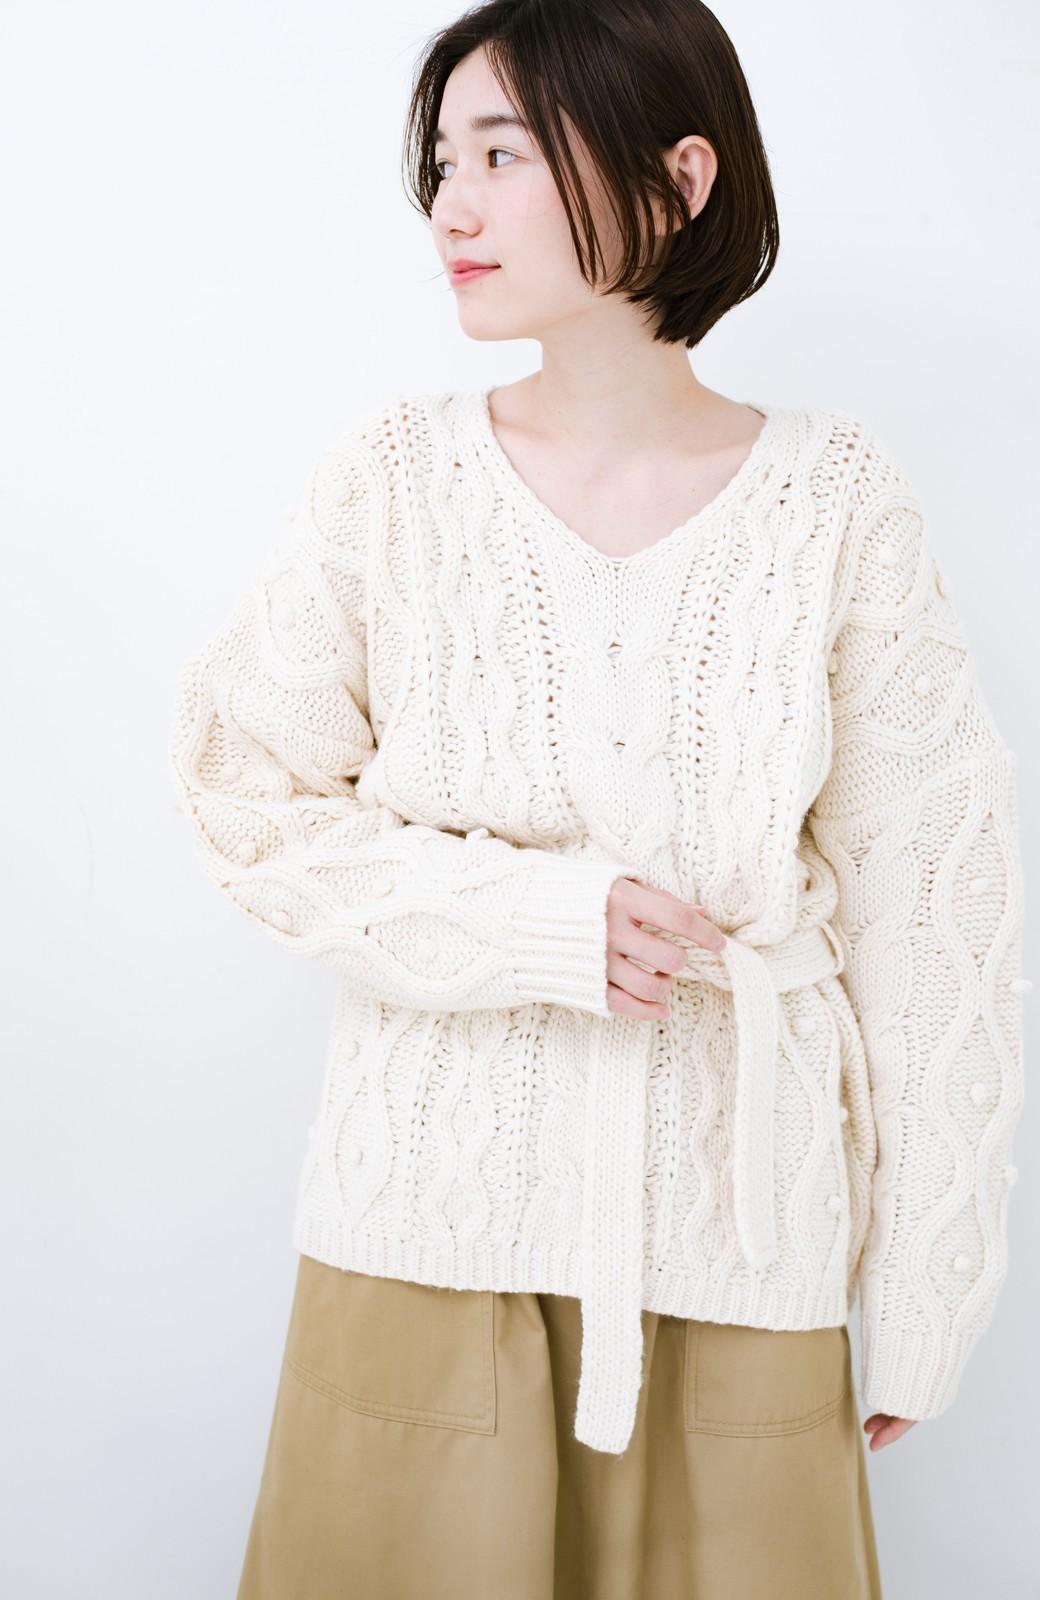 haco! <高橋愛さんコラボ>ラブ&ピースプロジェクト パプコーン編みのウエストマークケーブルニットトップス <オフホワイト>の商品写真13